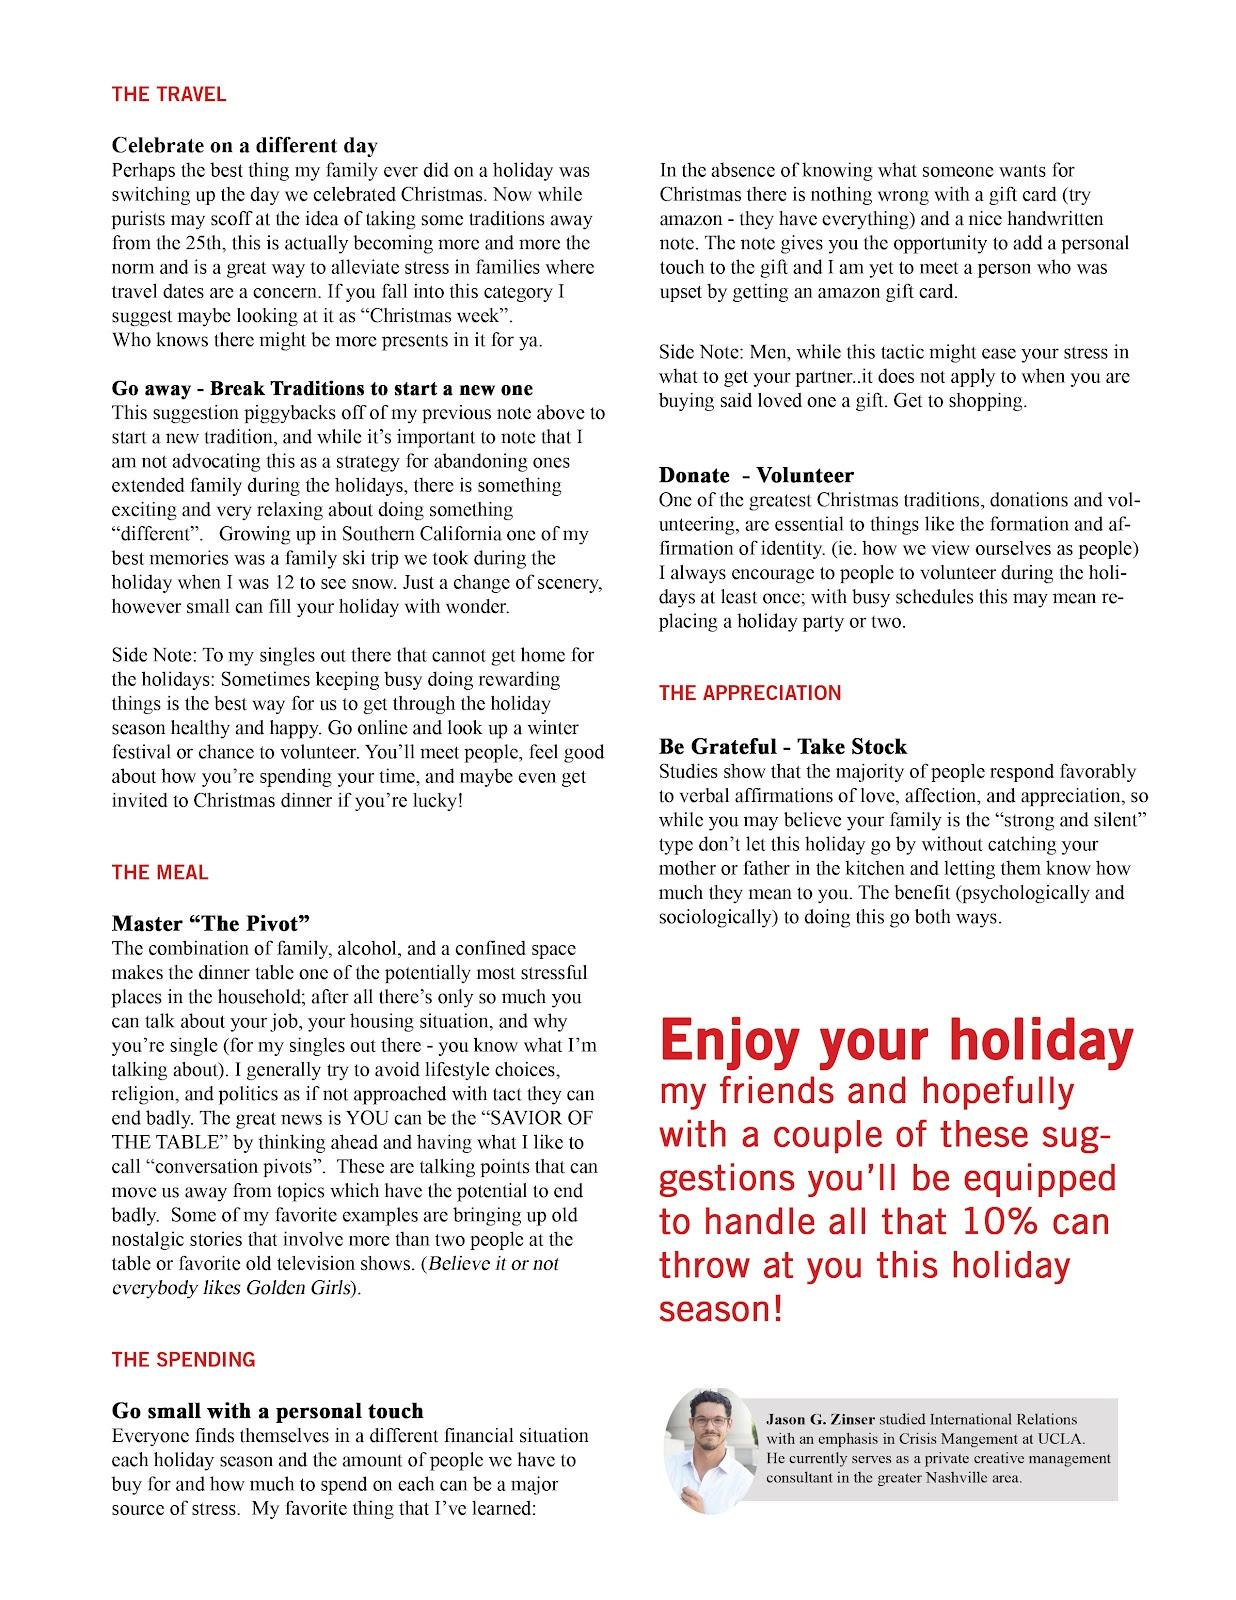 Plan Before Christmas page2.jpg